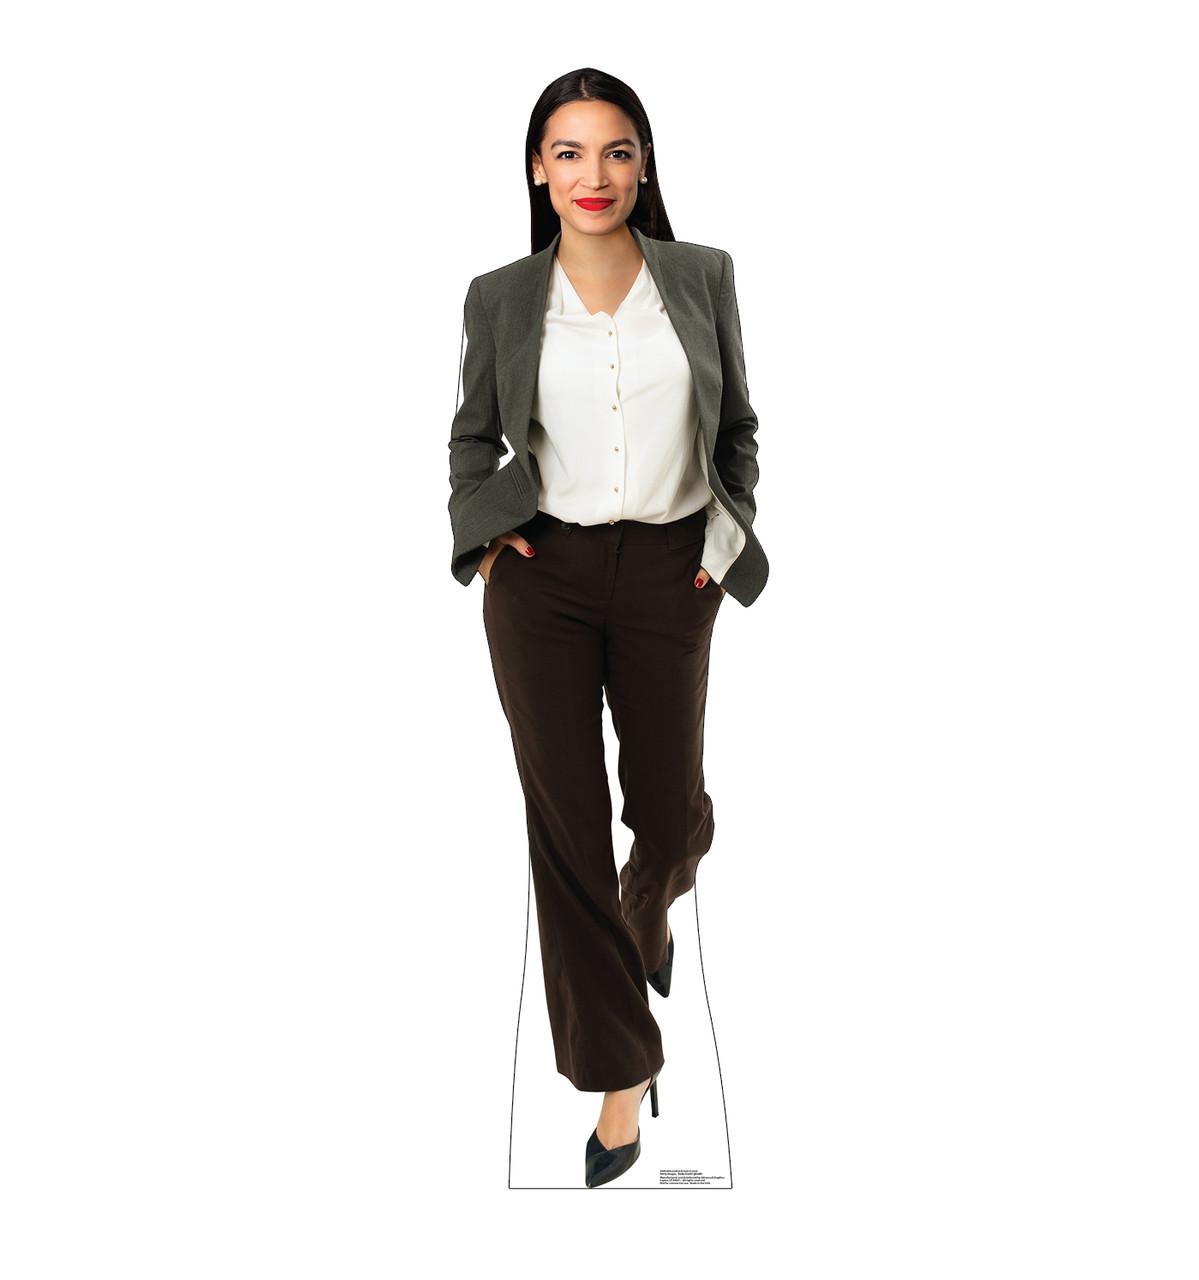 Representative Alexandria Ocasio-Cortez